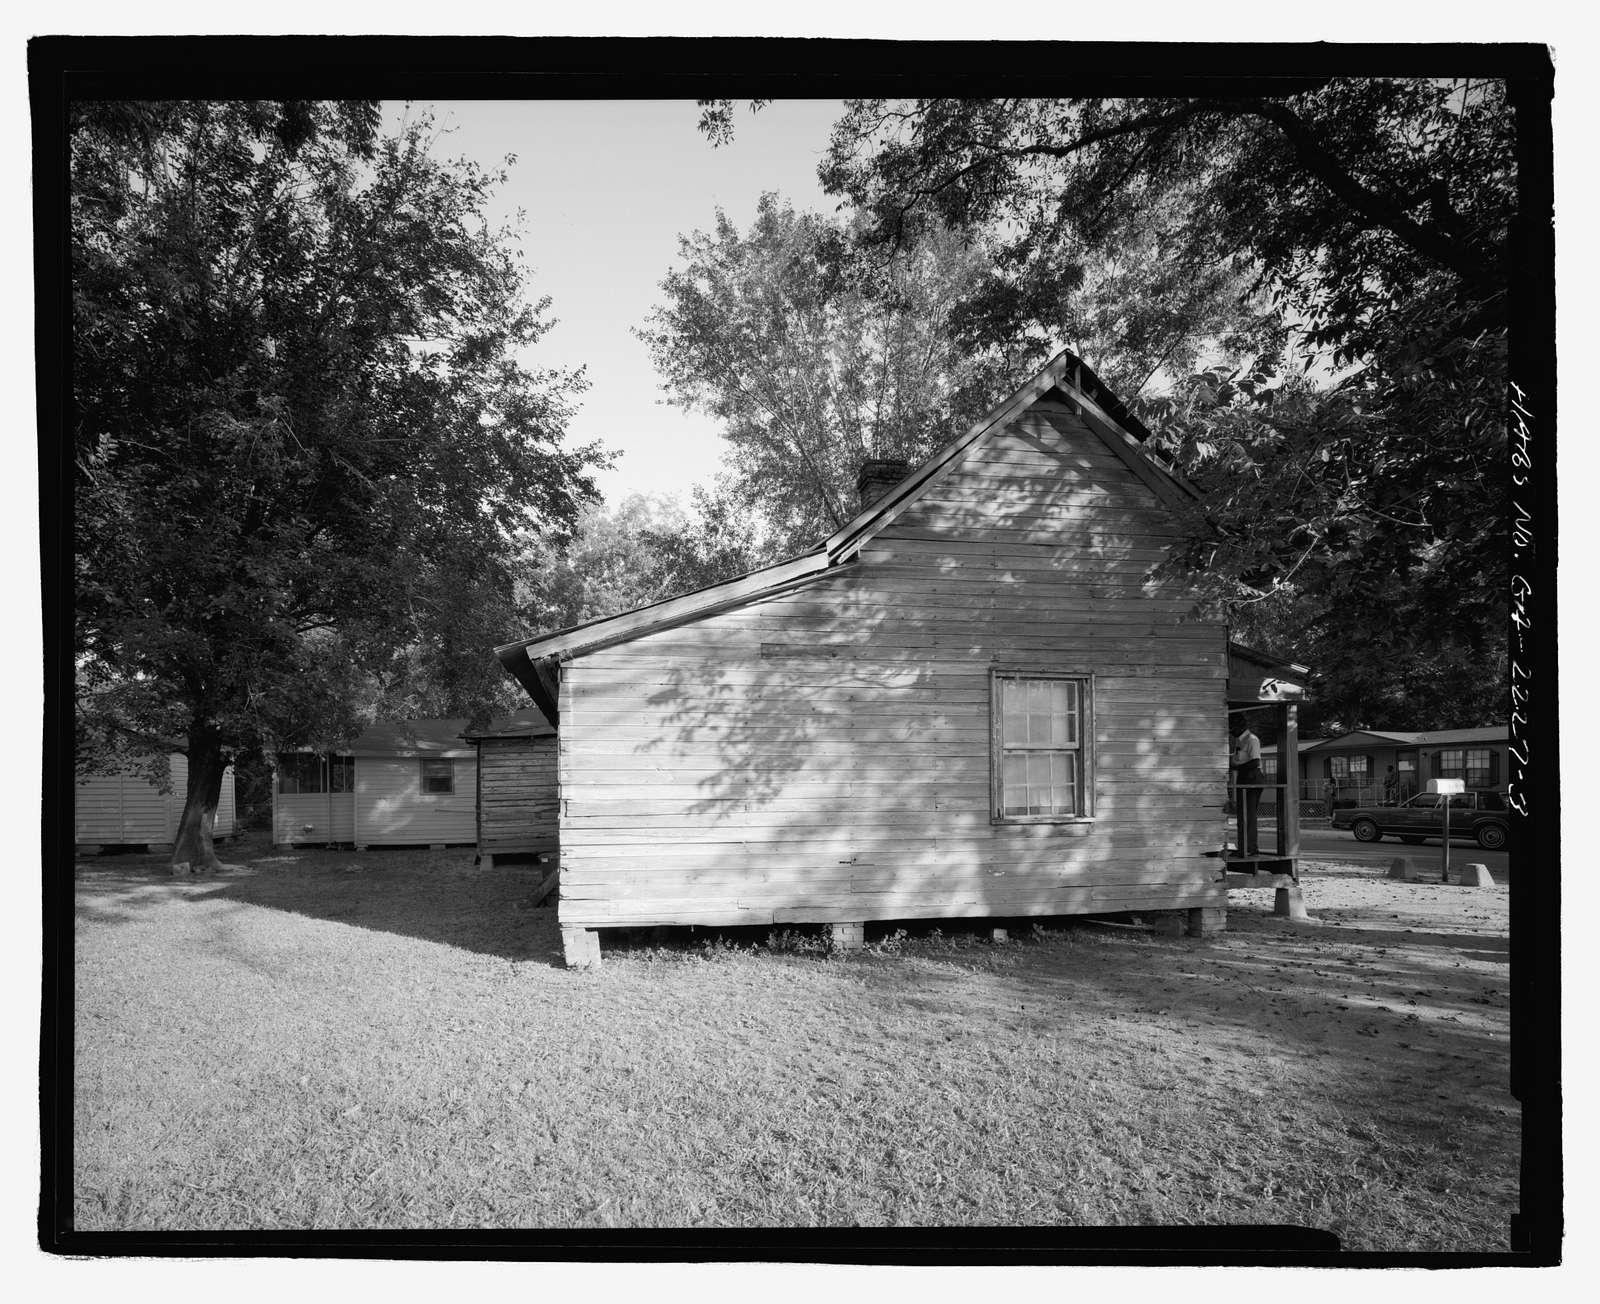 830 Short Bewick Street (House), Waycross, Ware County, GA